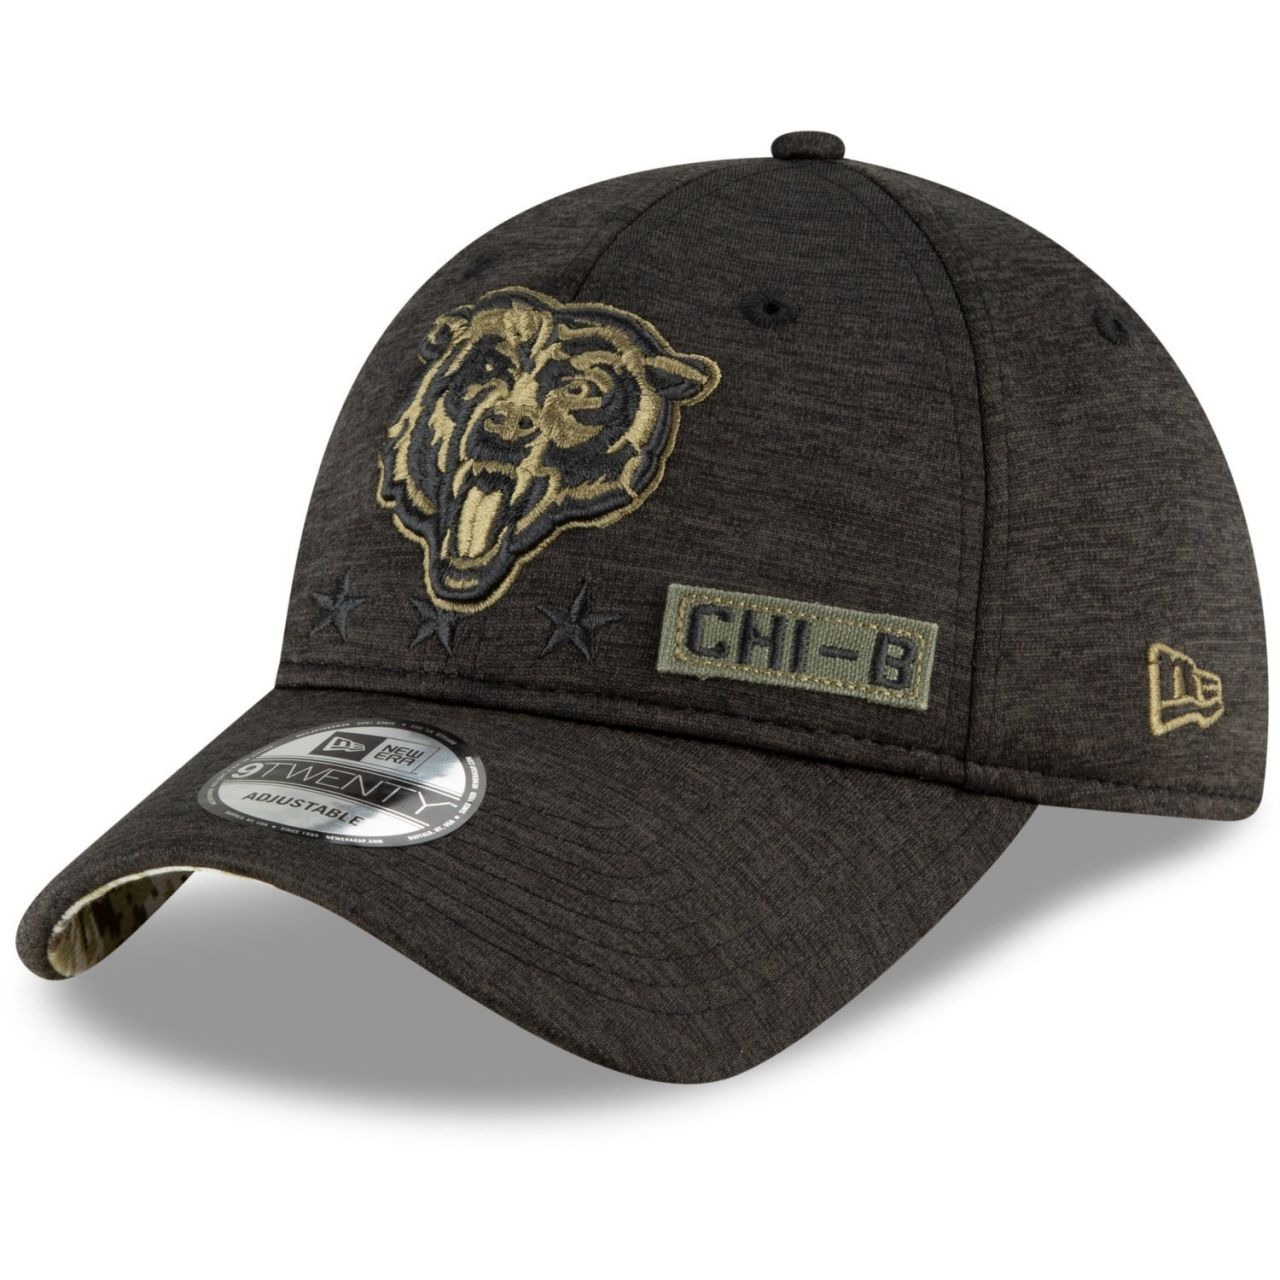 amfoo - New Era 9TWENTY Cap Salute to Service Chicago Bears